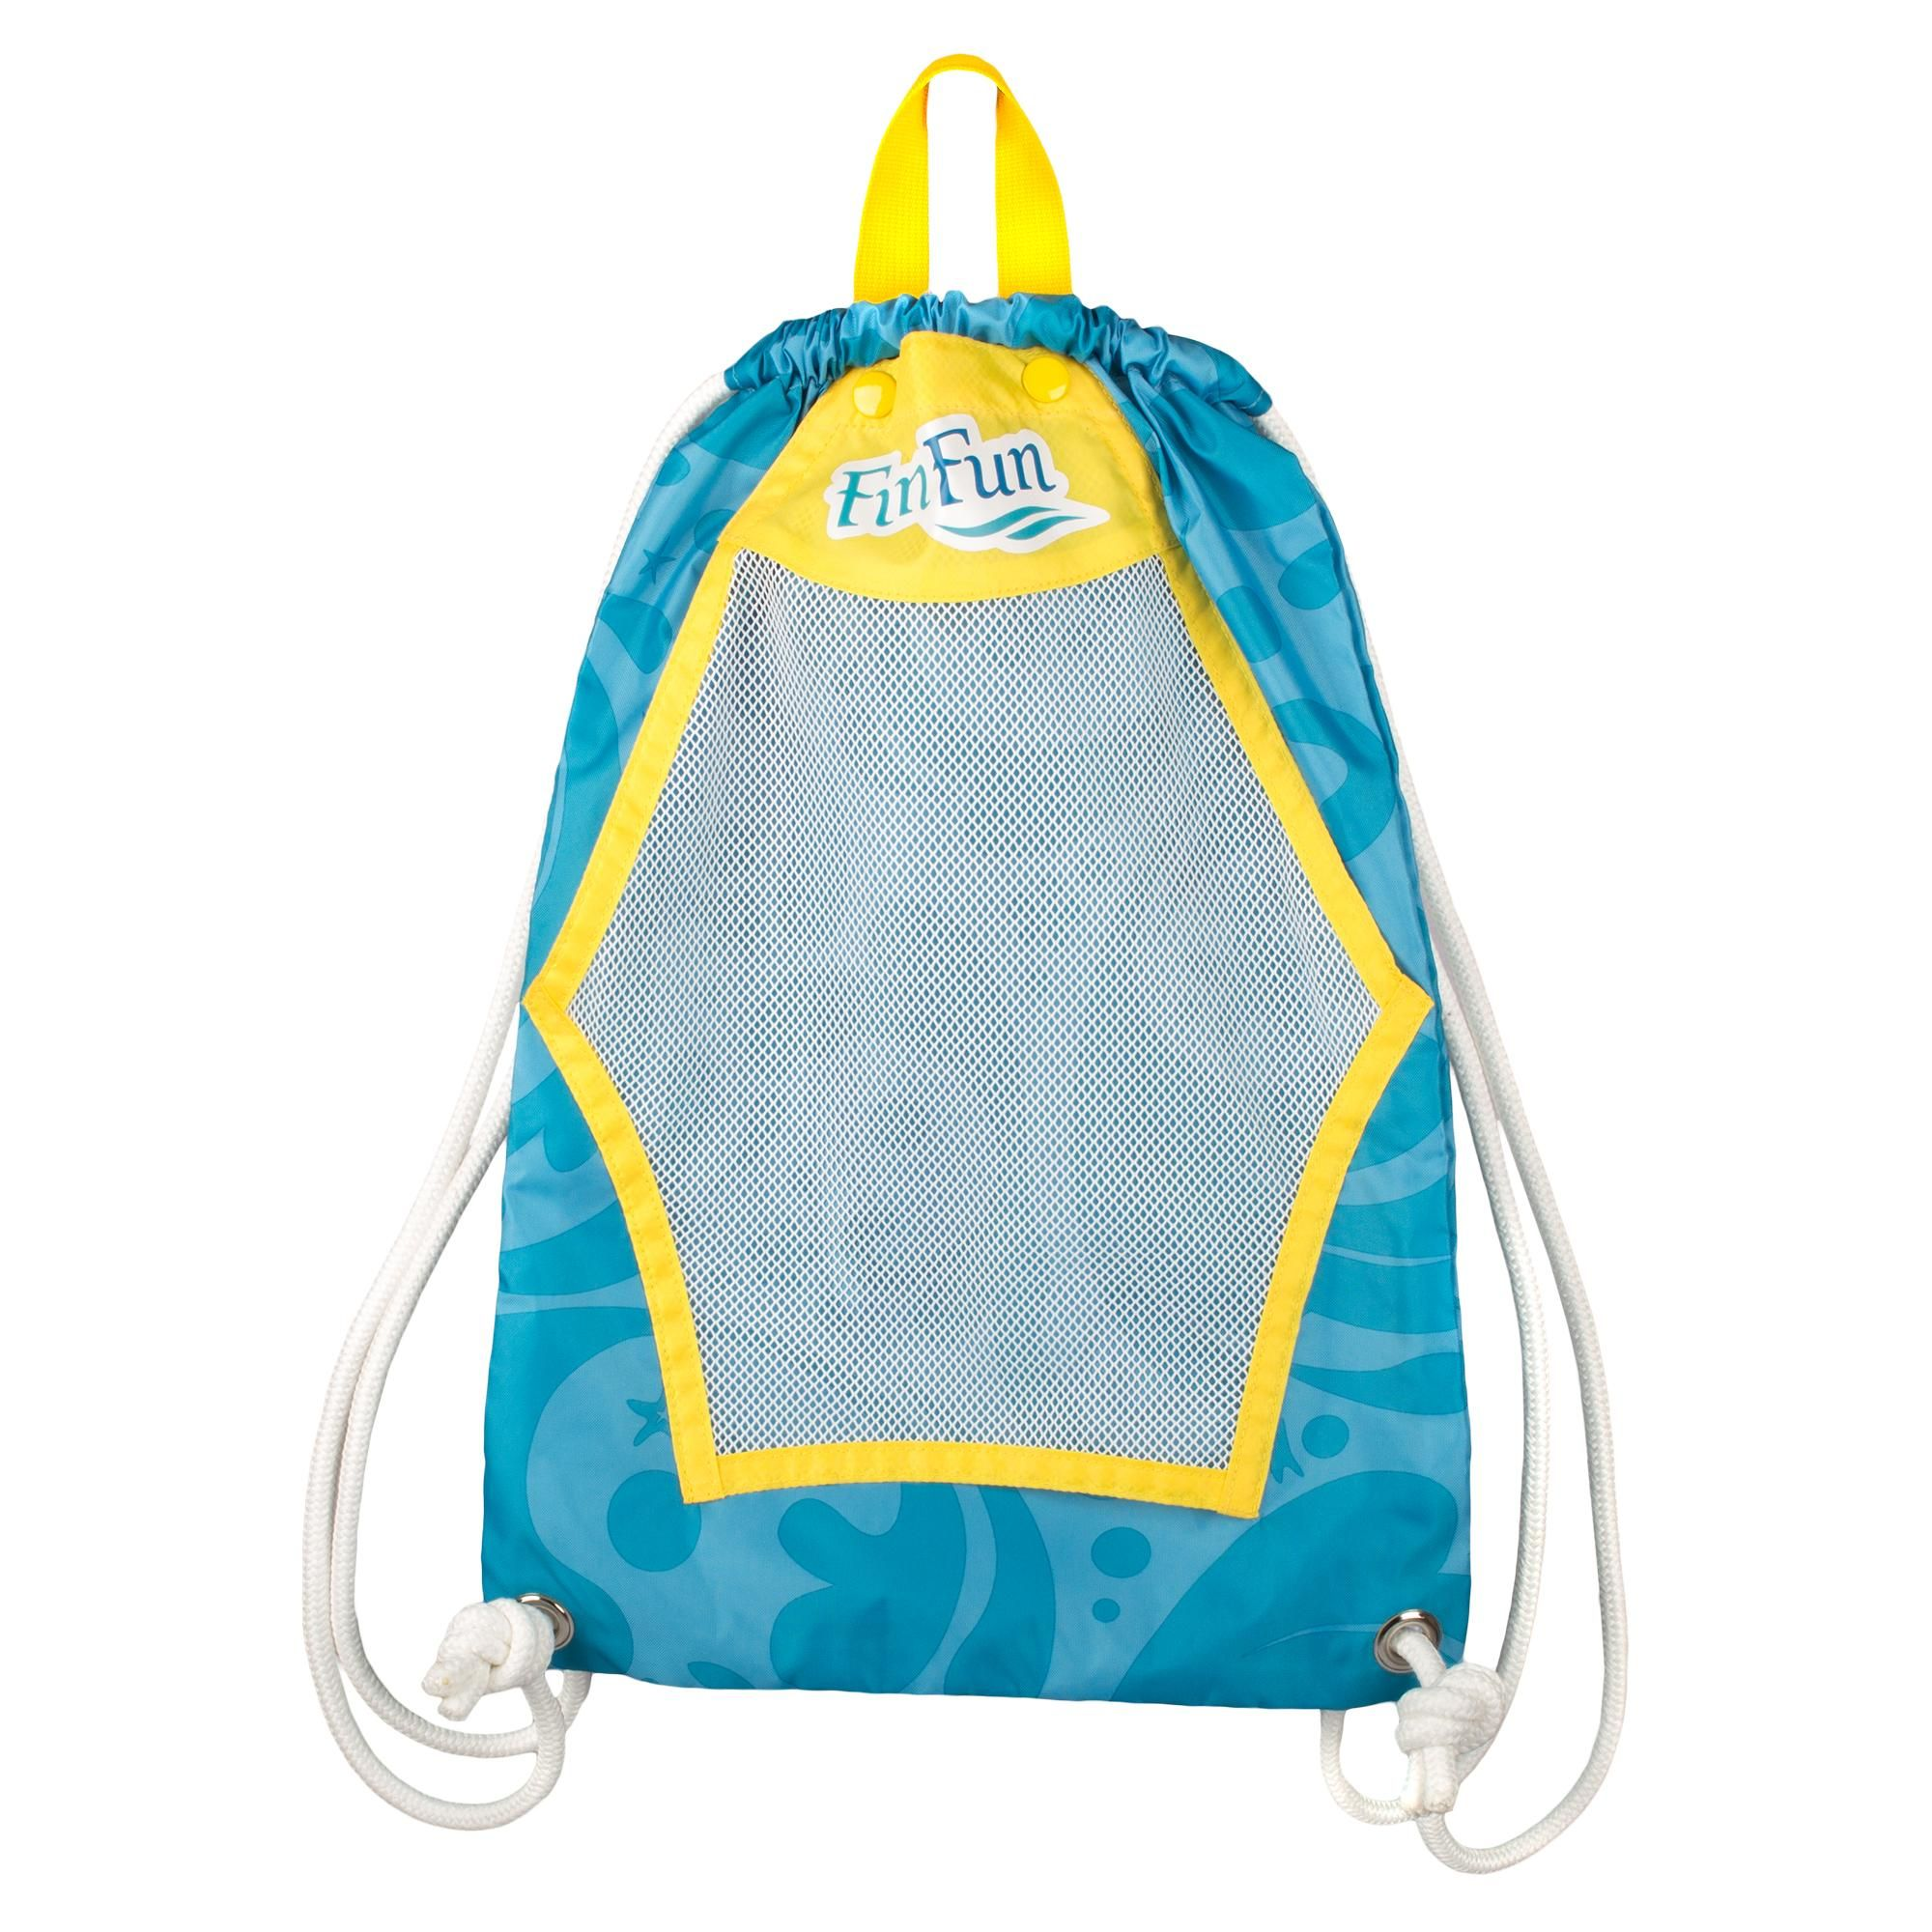 bfe43e66a819 Fin Fun Backpack